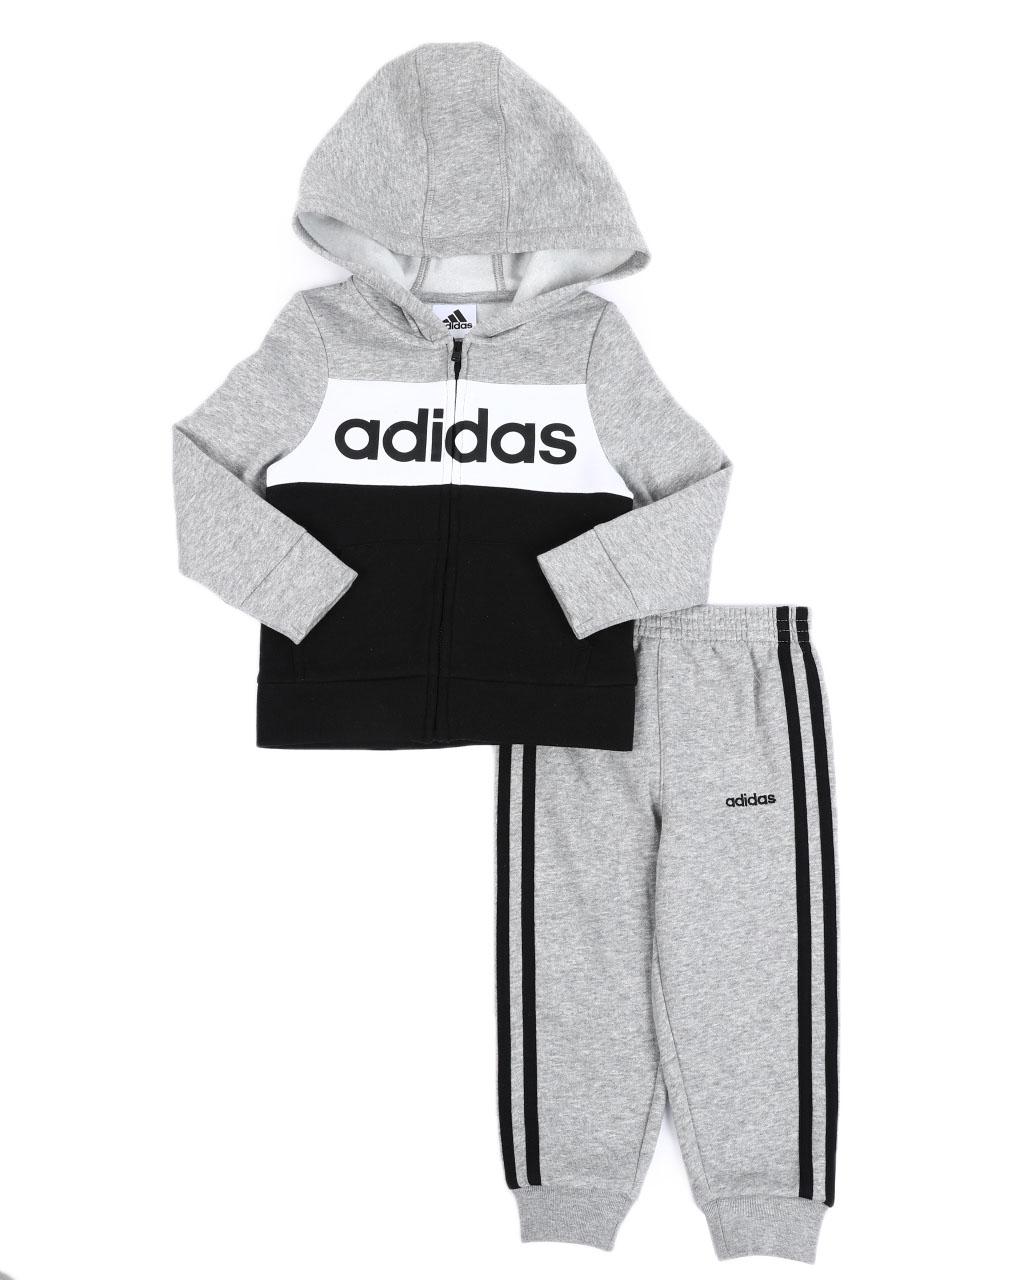 Adidas Boys 2-Piece Hooded Fleece Track Jacket /& Pants Set # 4T